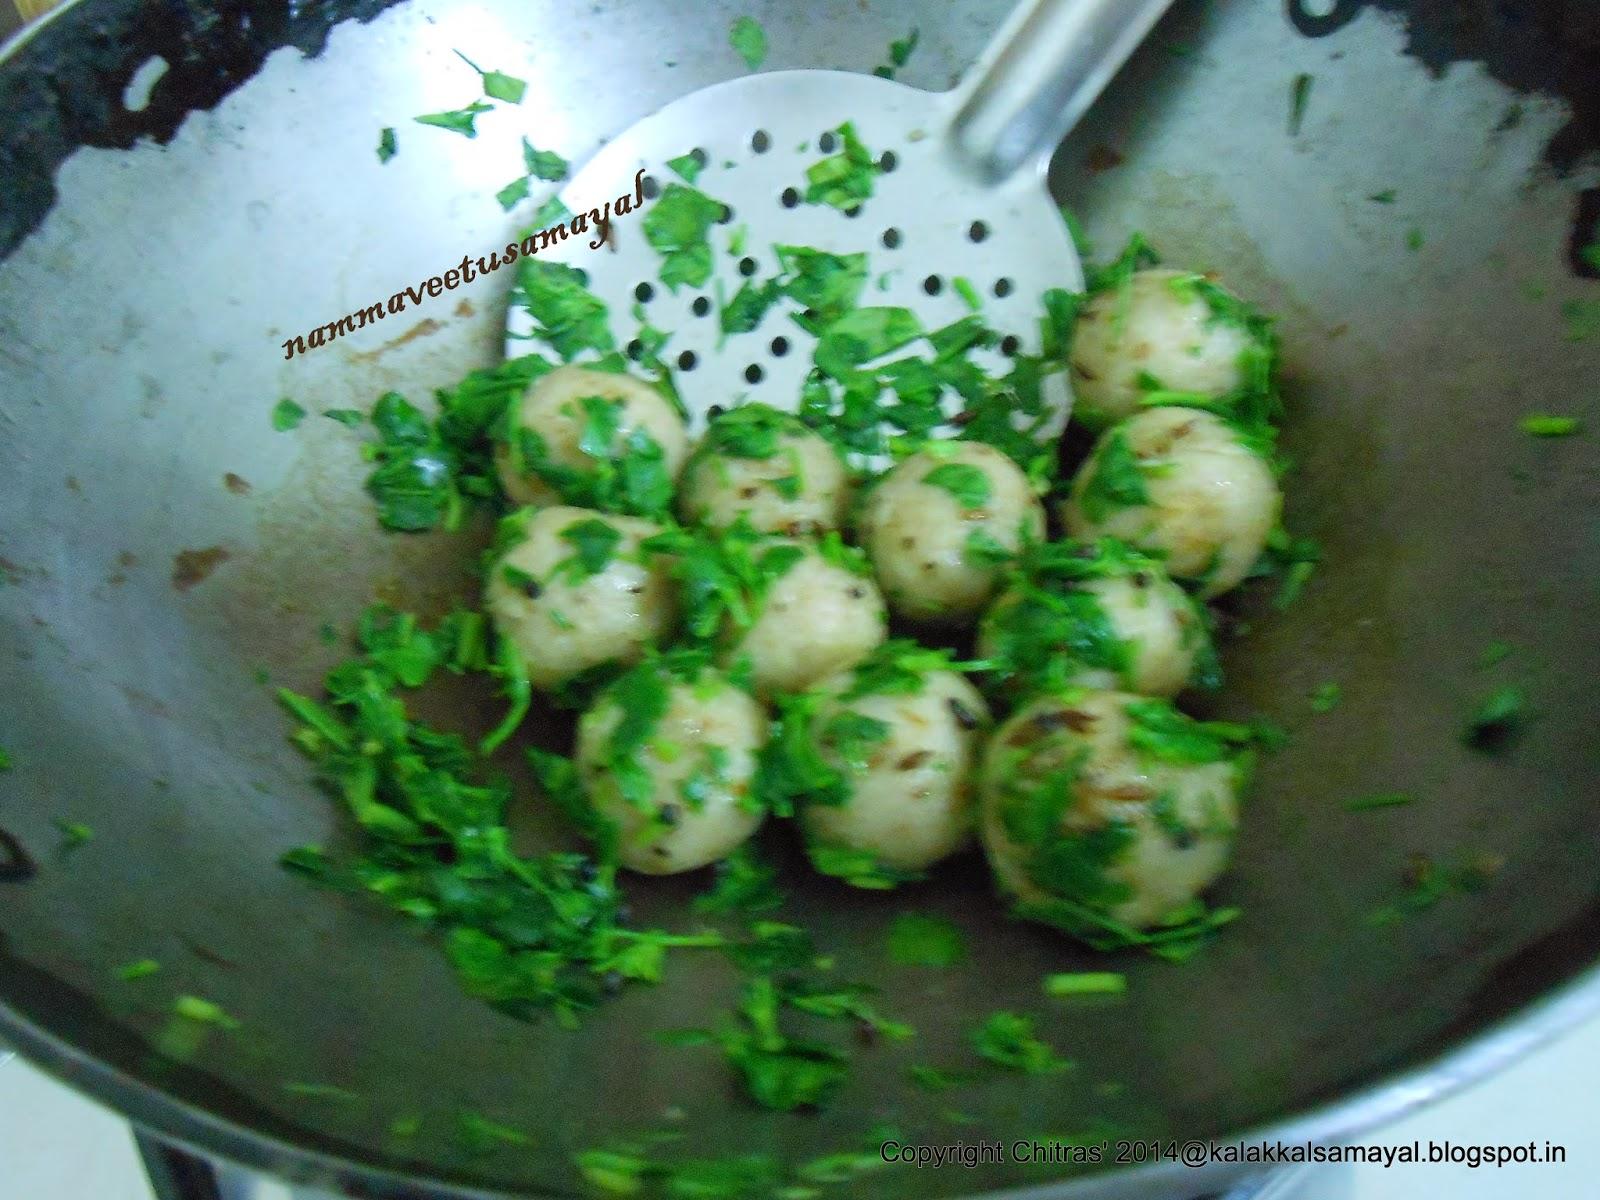 Oats-Amaranth Neer Kozhukattai [ Oats-Amaranth Dumpling ]